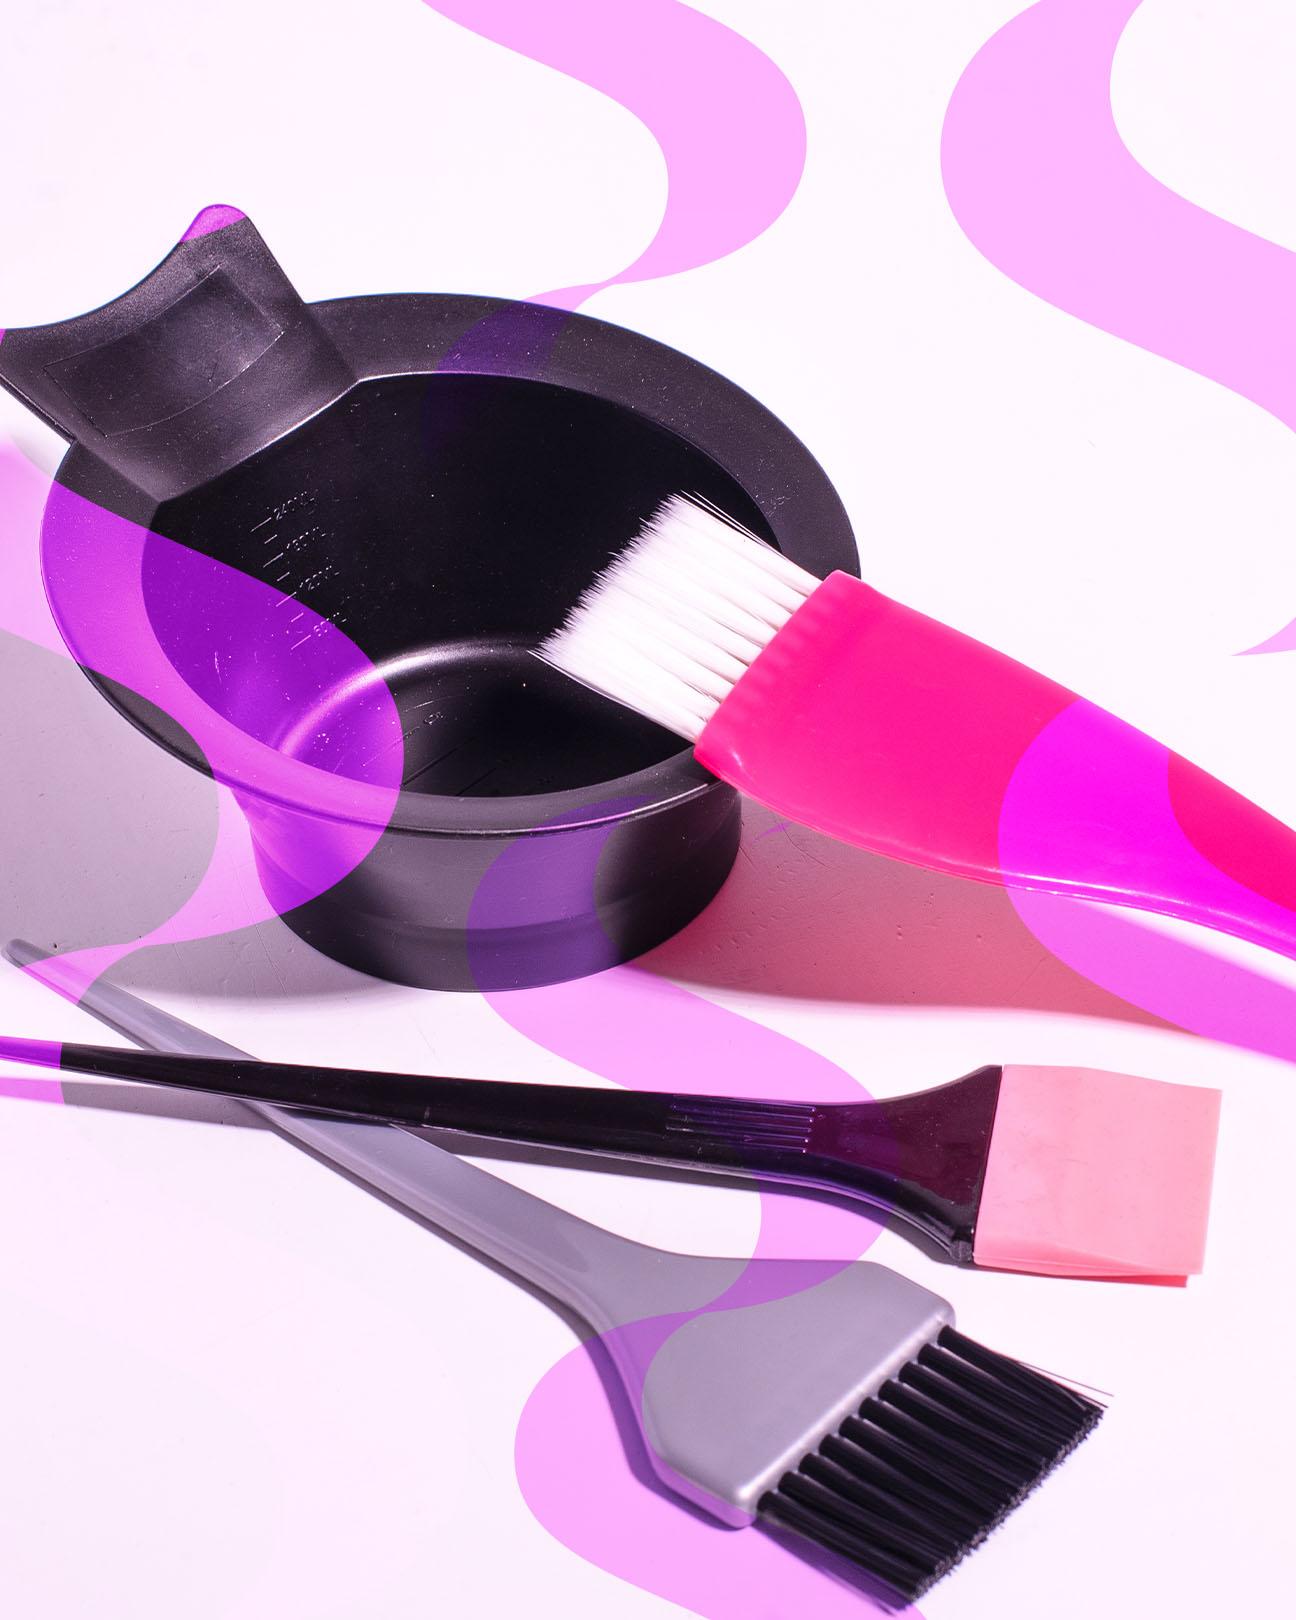 SSG_2020_03March_WebsiteImages_DeepCosmoPGS_Image04 1800 Hour Designer Curriculum